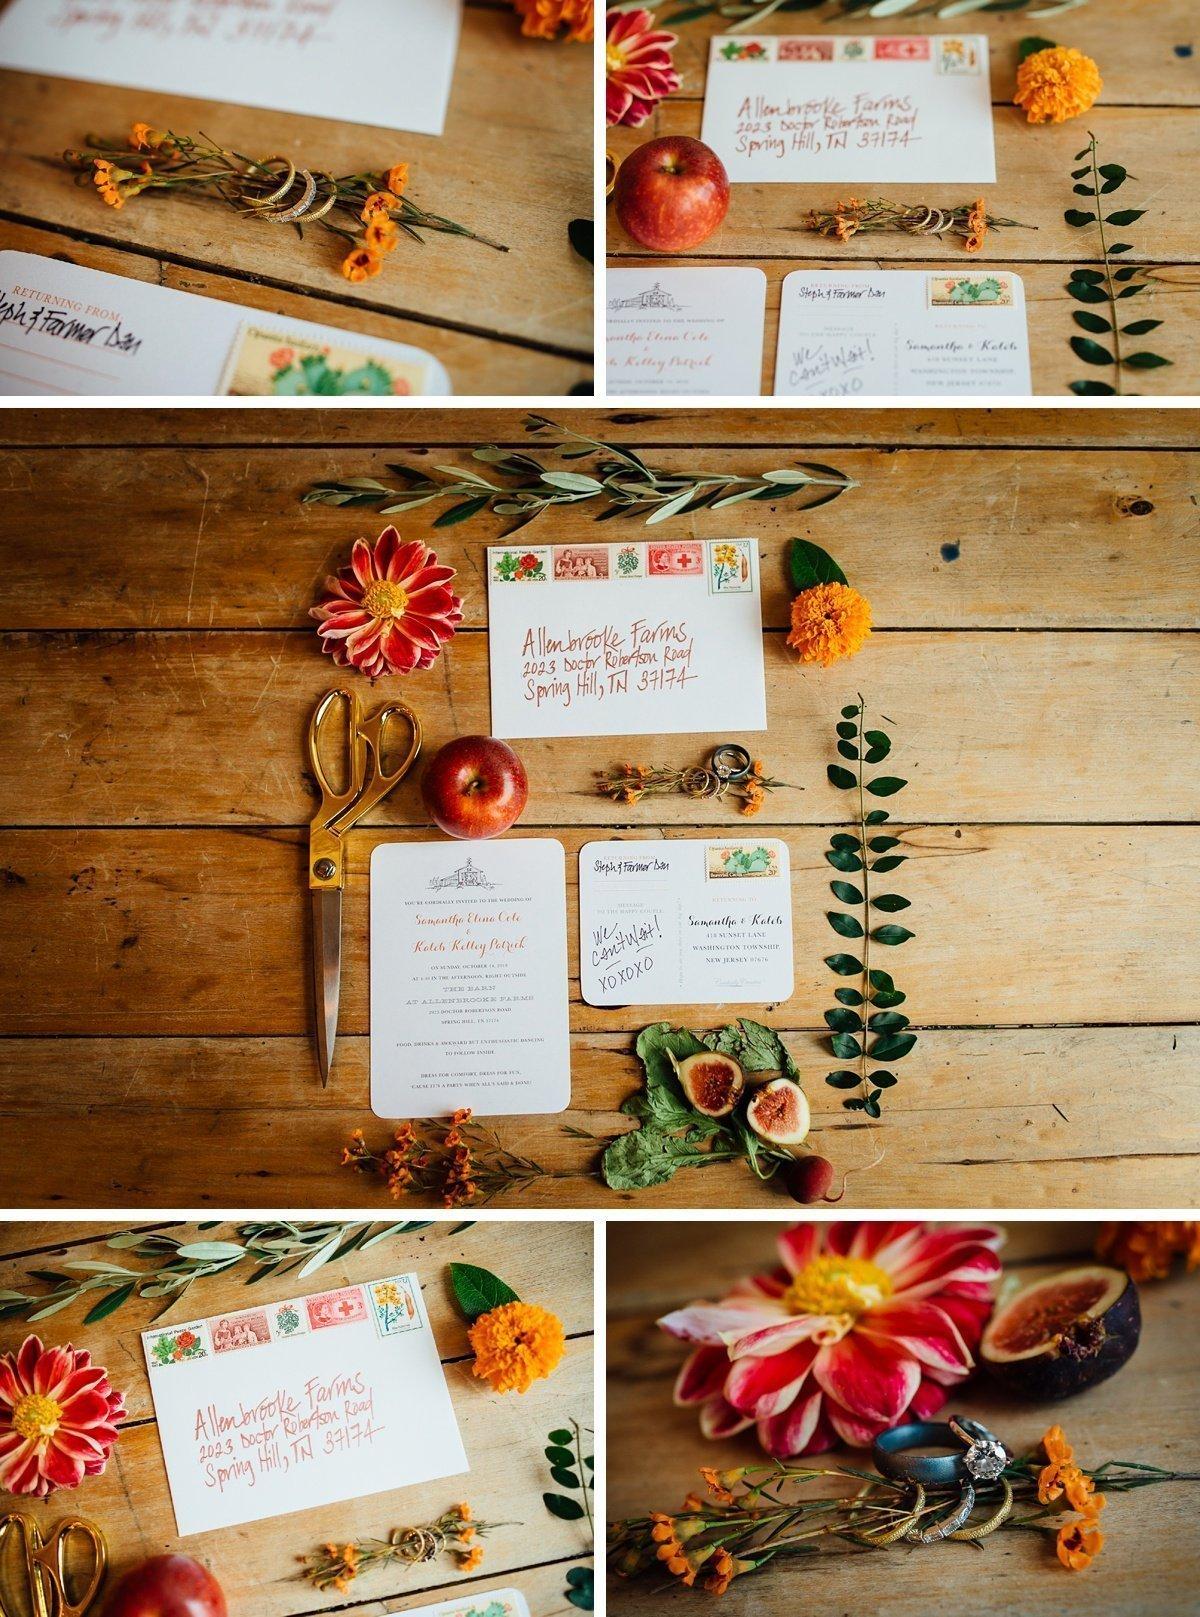 allenbrooke-wedding-details-flatlay Allenbrooke Farms | Spring Hill TN Wedding | Sam and Kaleb